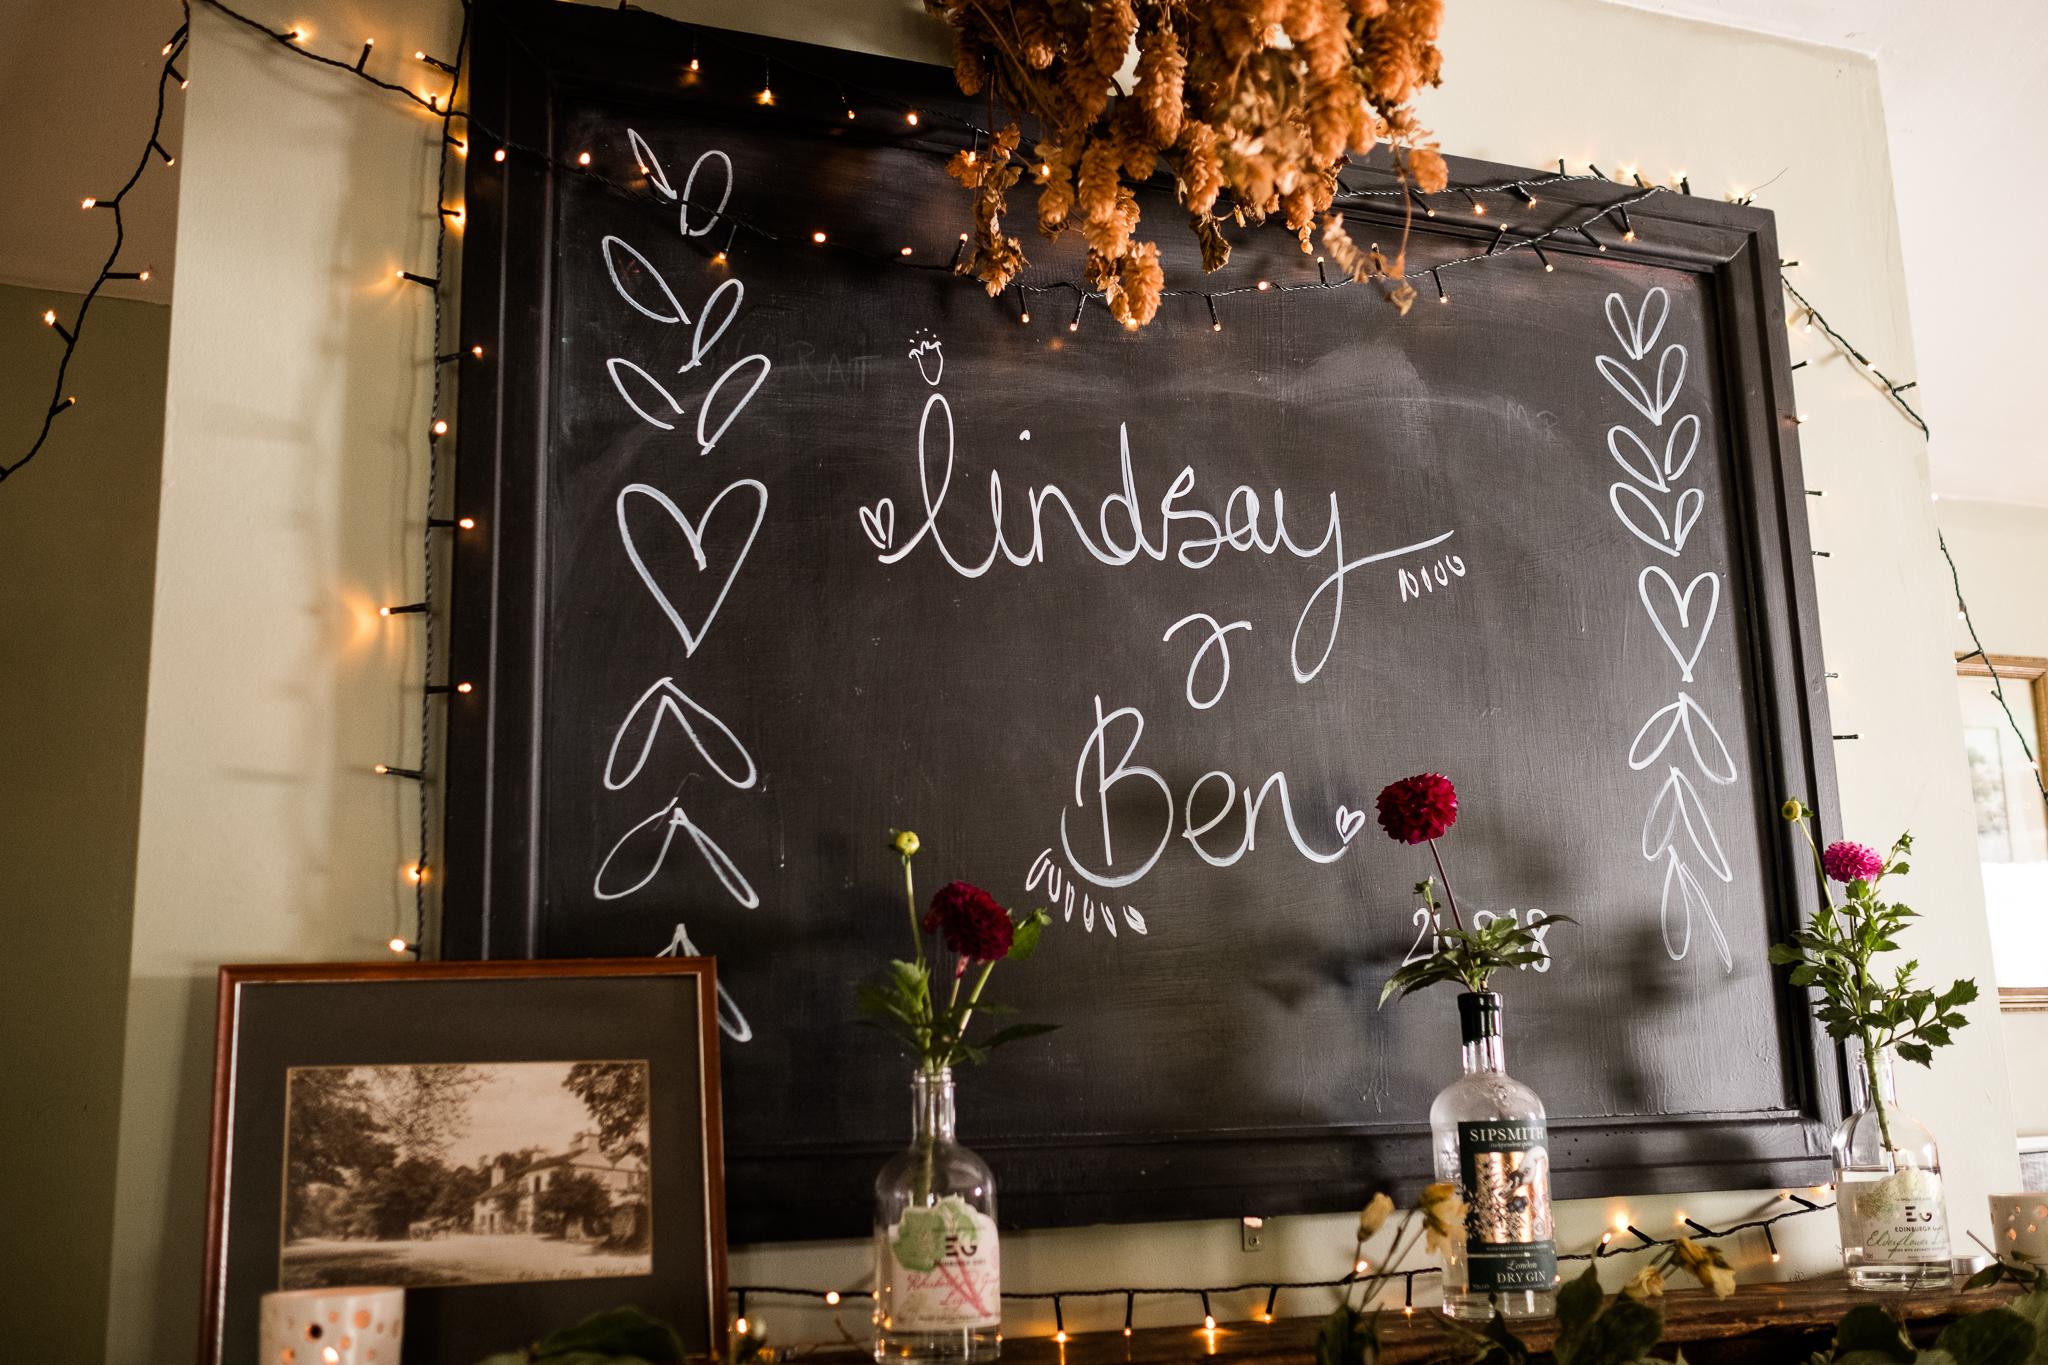 Relaxed Documentary Wedding Photography at The Wizard Inn, Alderley Edge Cheshire - Jenny Harper-14.jpg